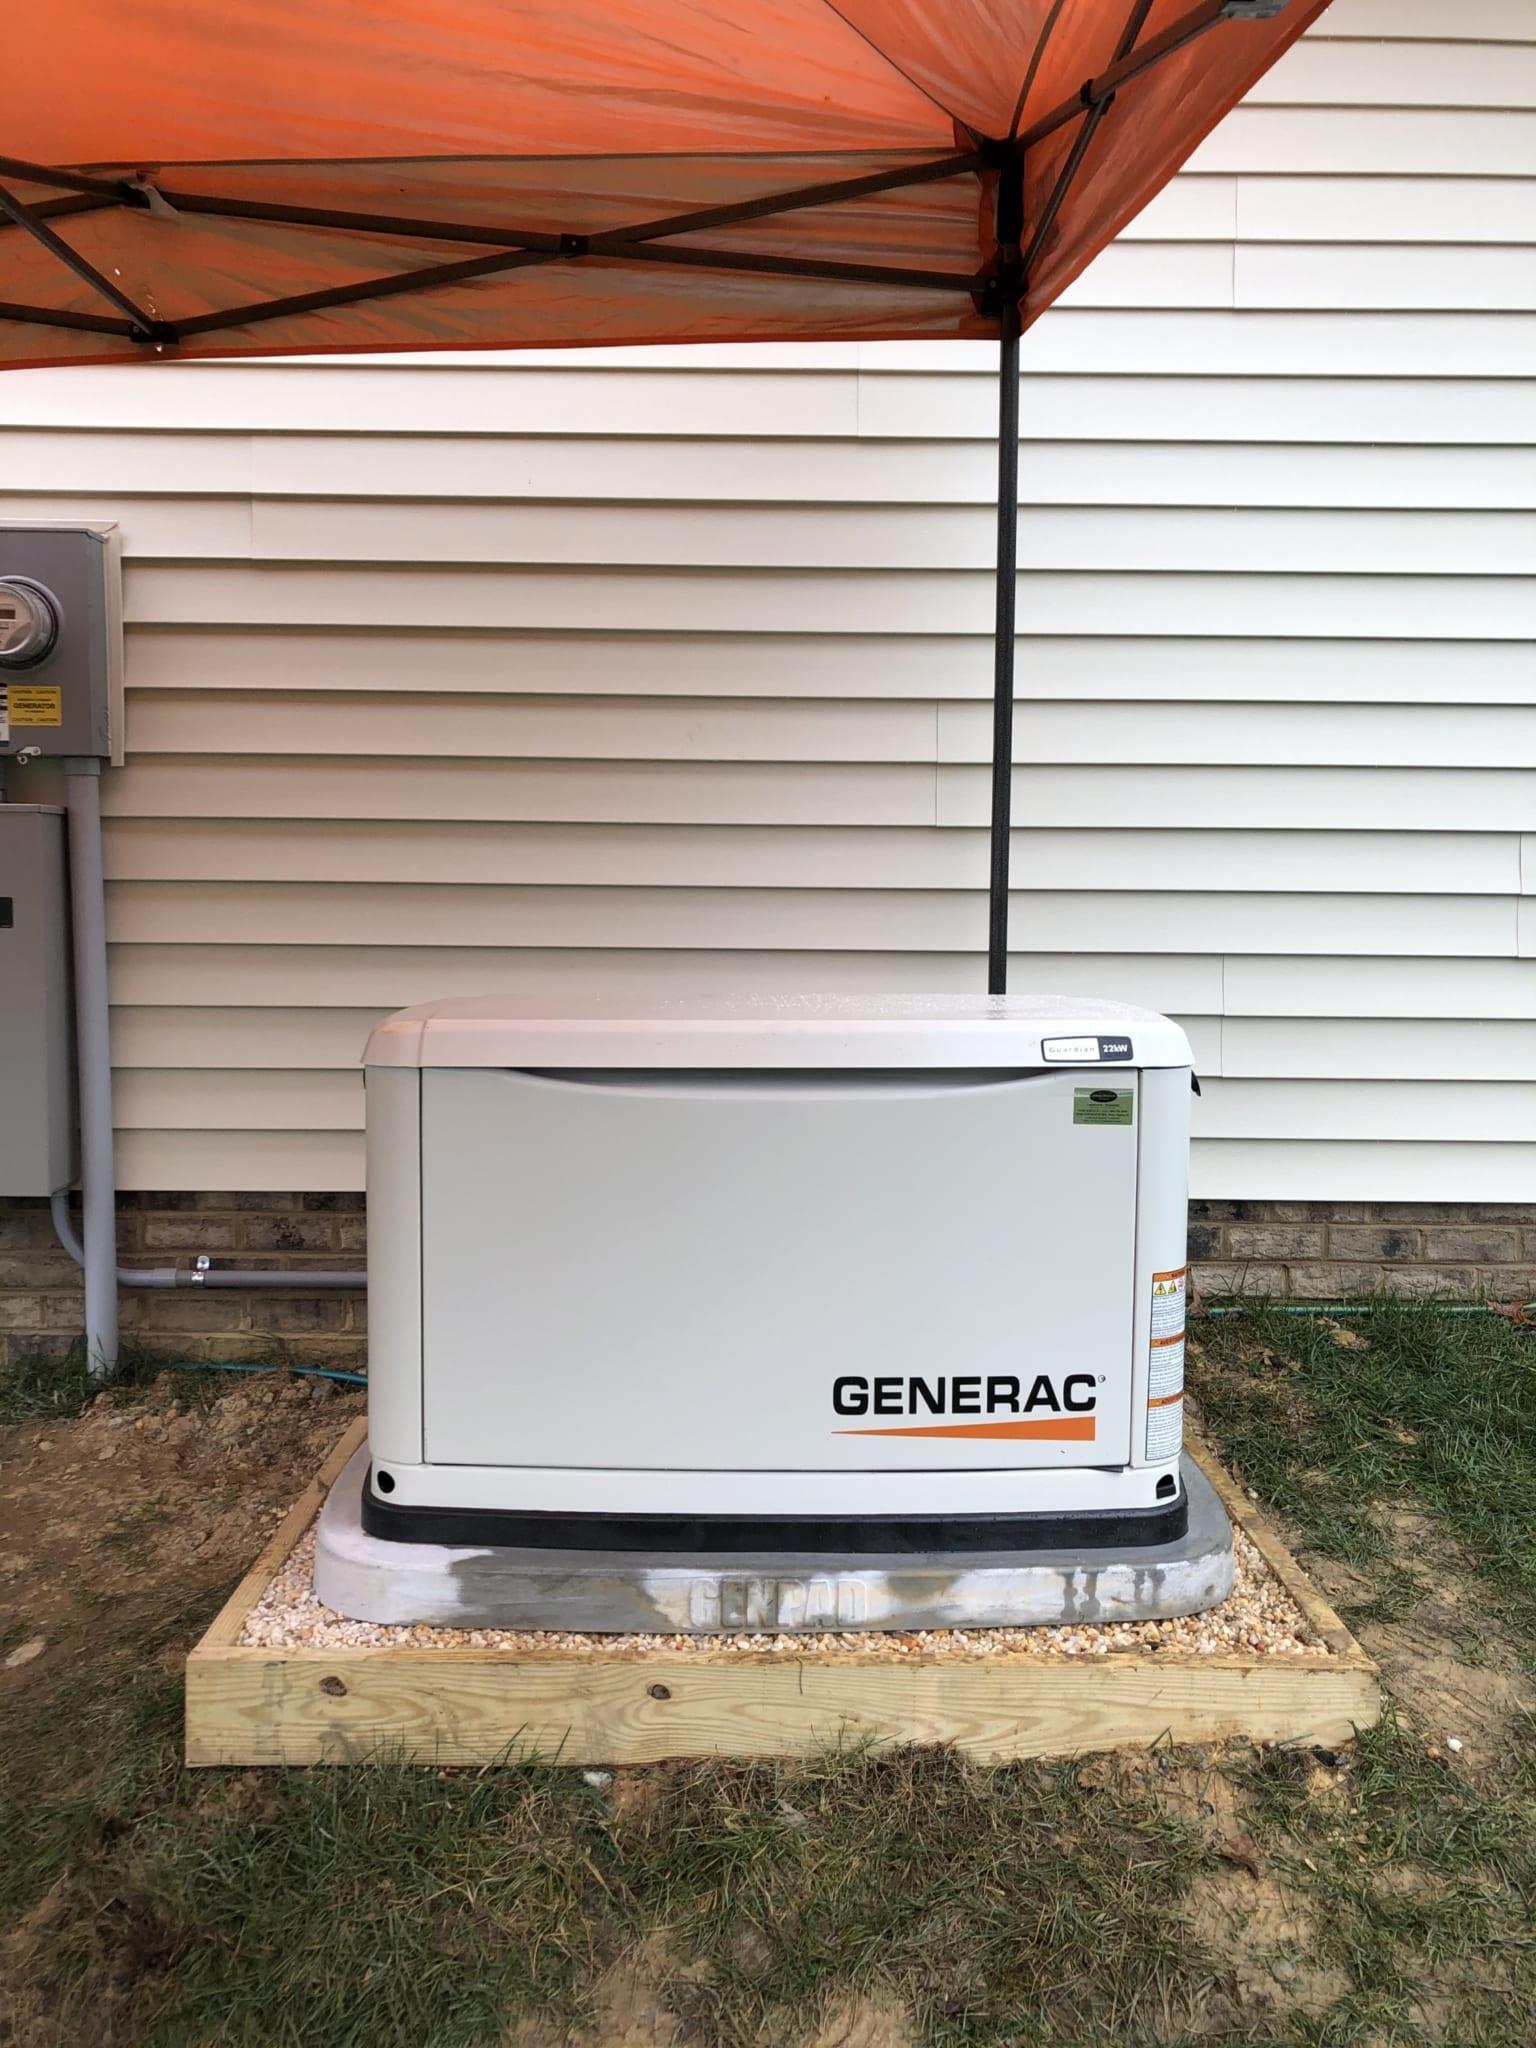 12.7.20 Chesterfield Generac Automatic Standby Generator